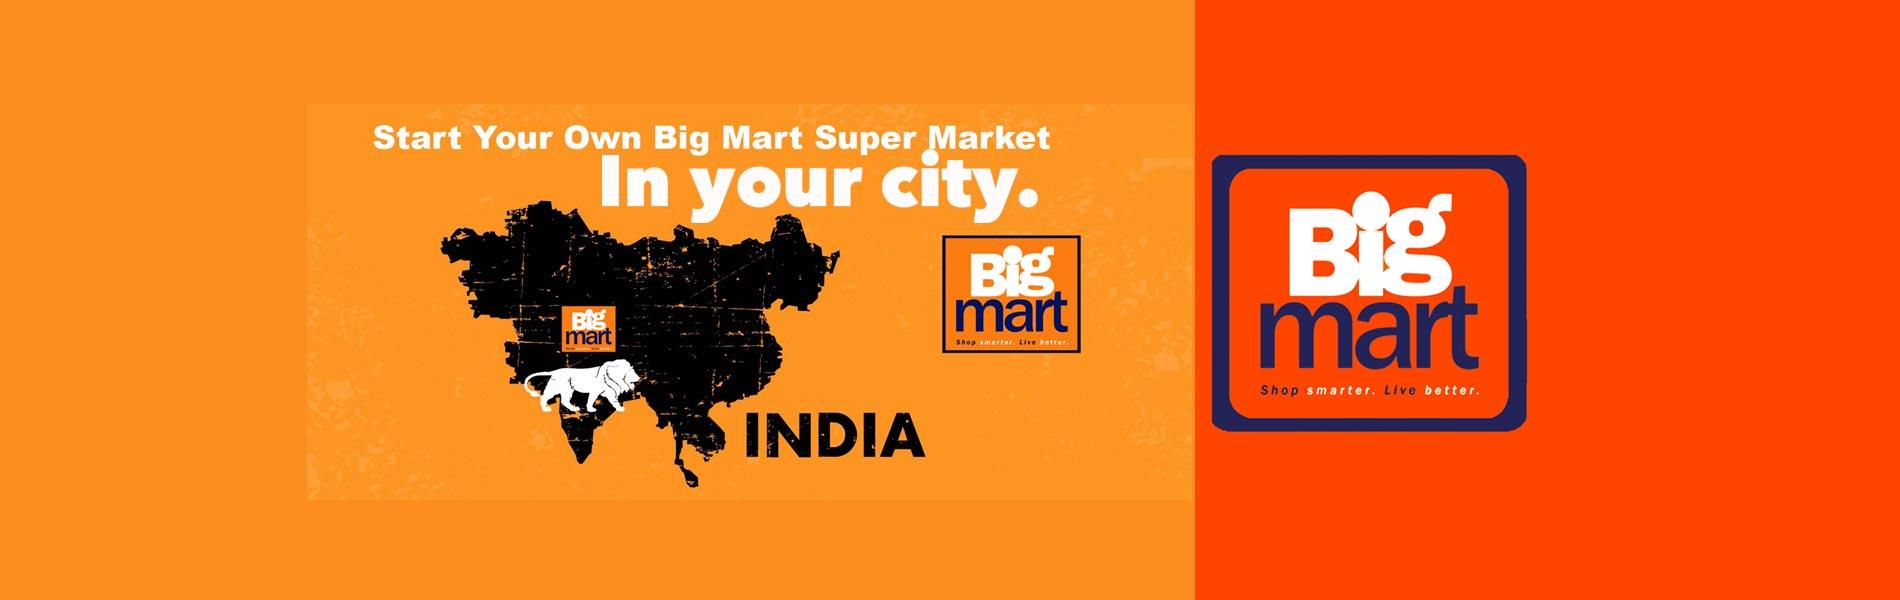 Big Mart Retail Corporation - No 1 Grocery SuperMarket